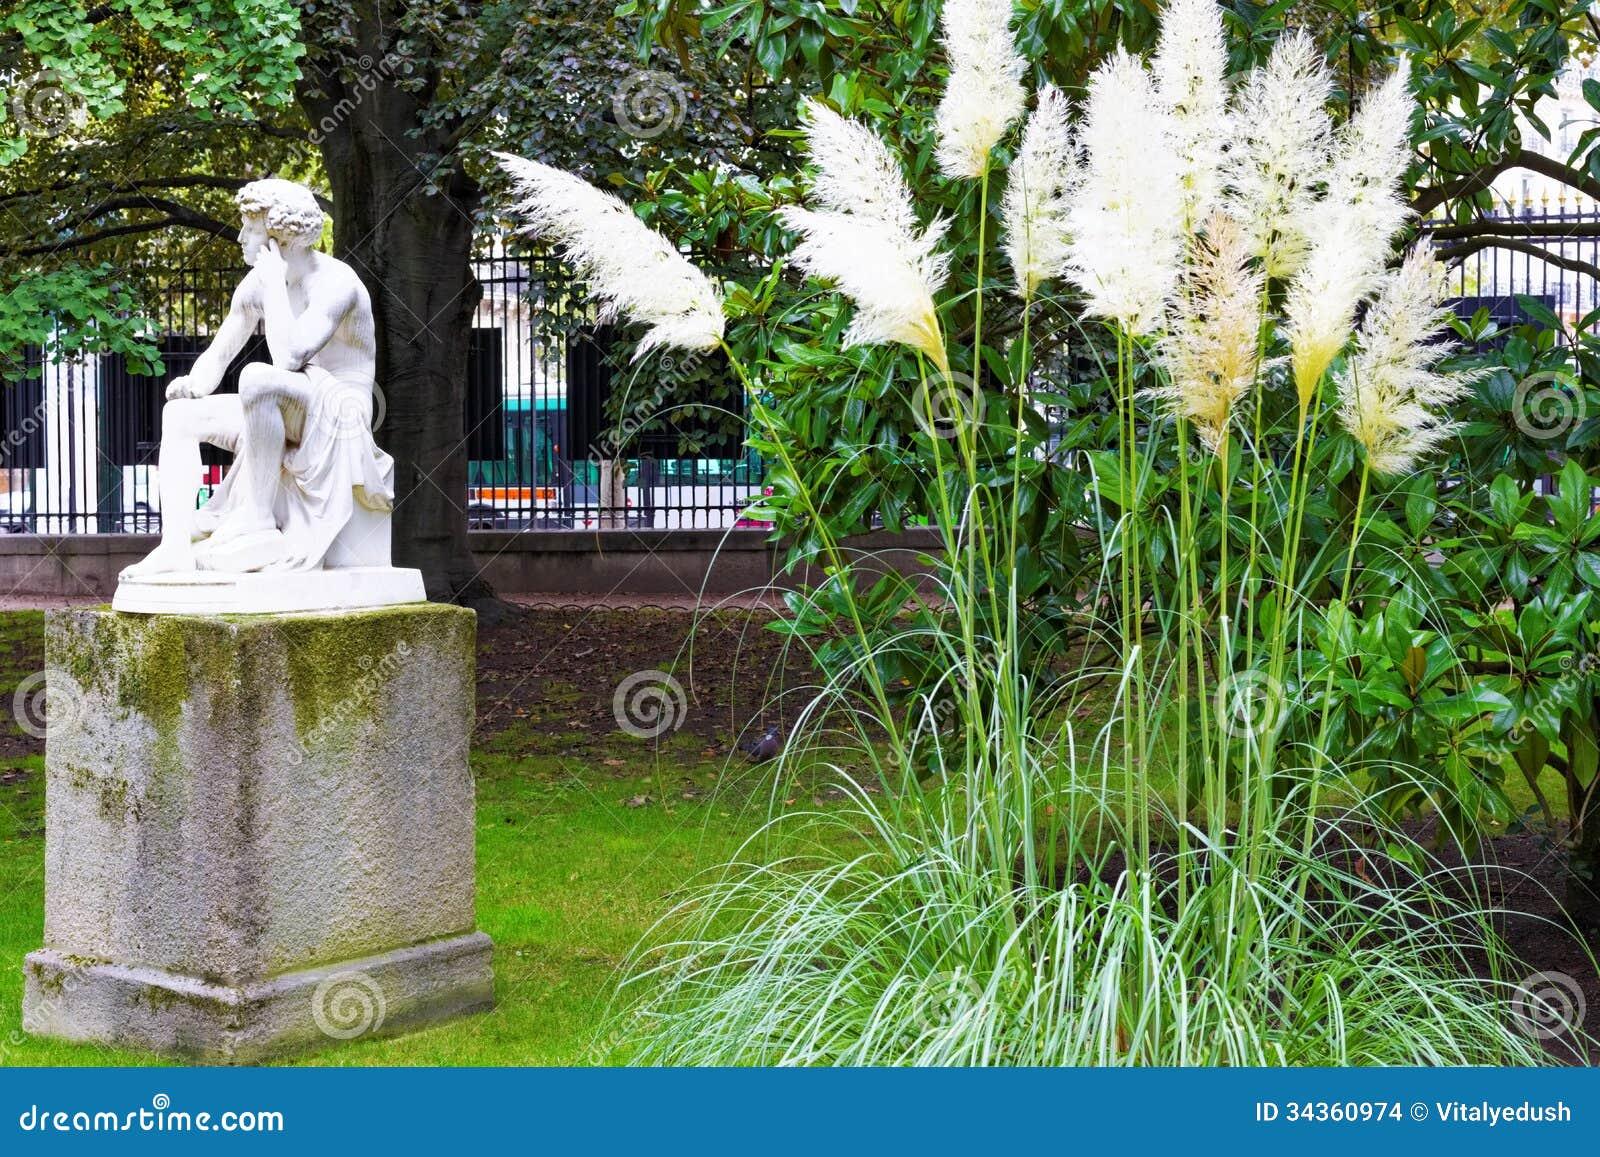 Luxembourg garden jardin du luxembourg in paris france for Jardin paris